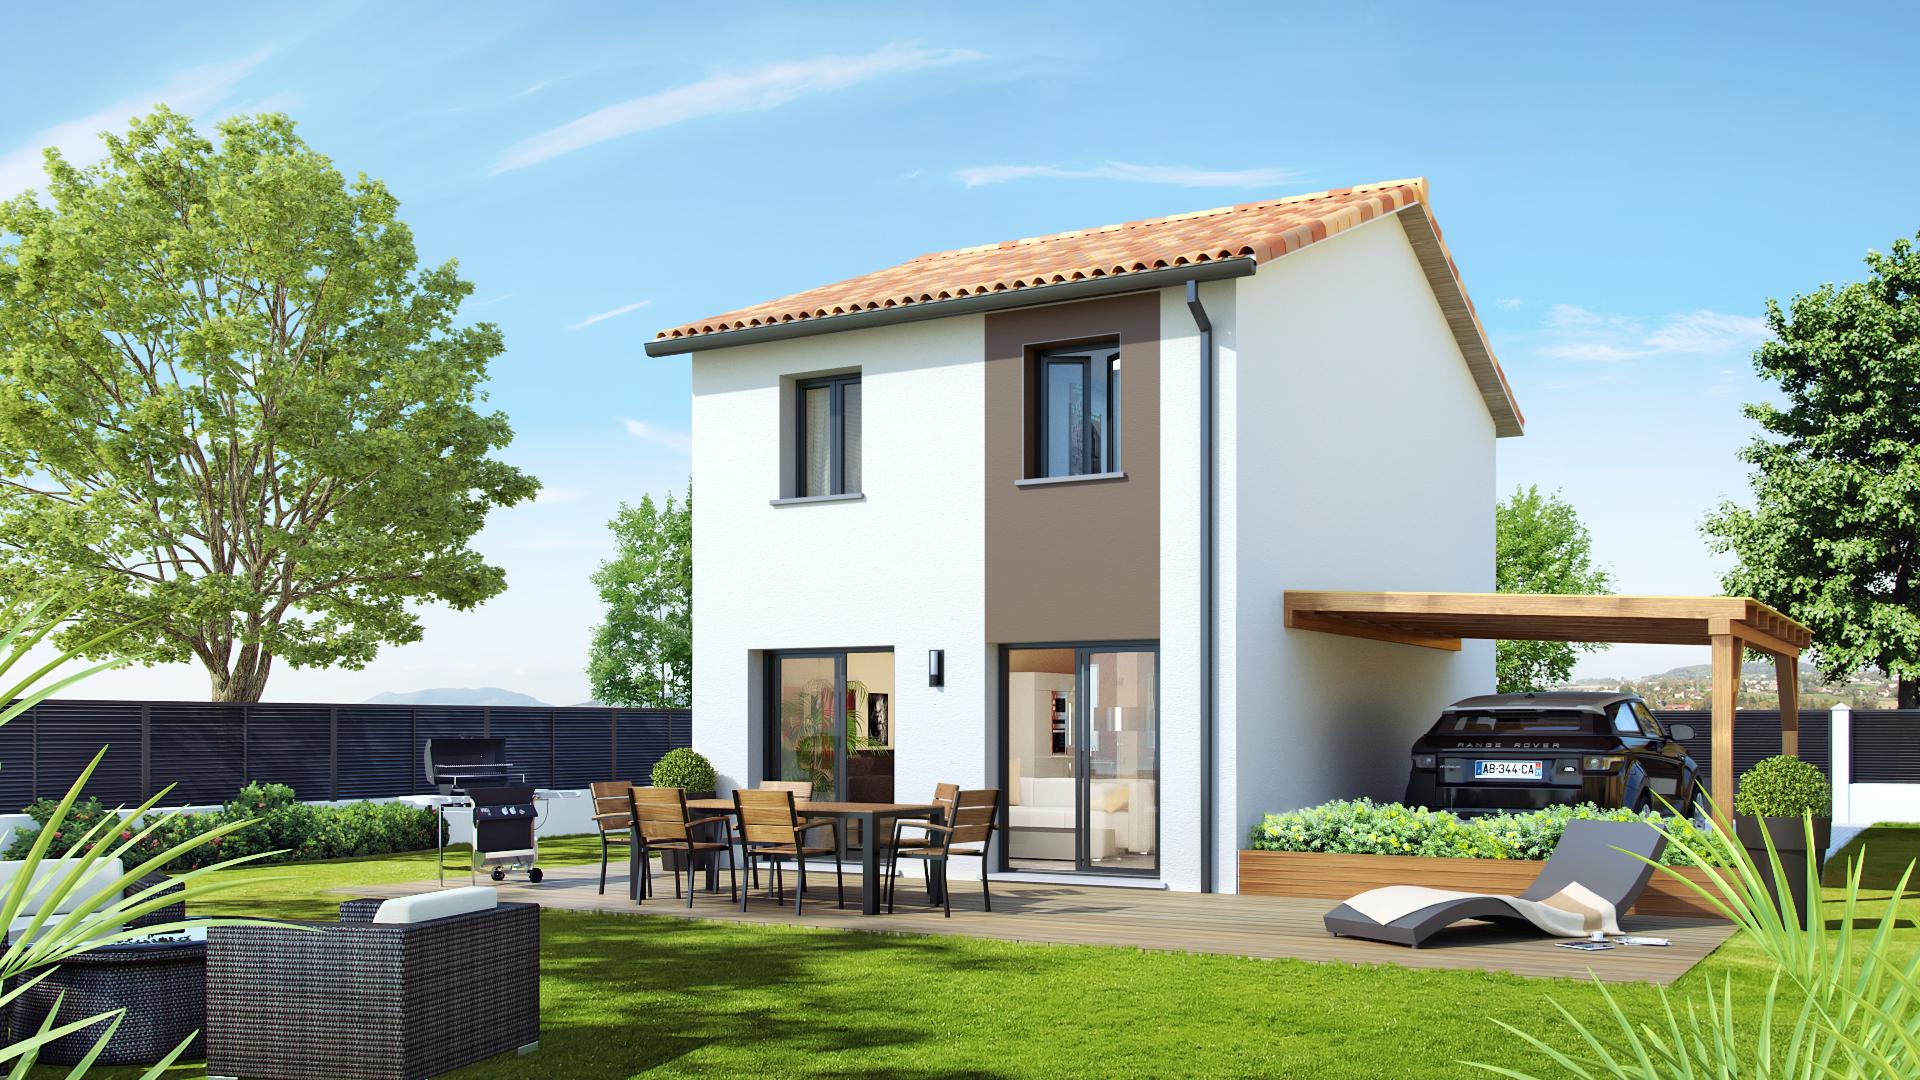 top duo roanne constructeur immobilier roanne 42300. Black Bedroom Furniture Sets. Home Design Ideas